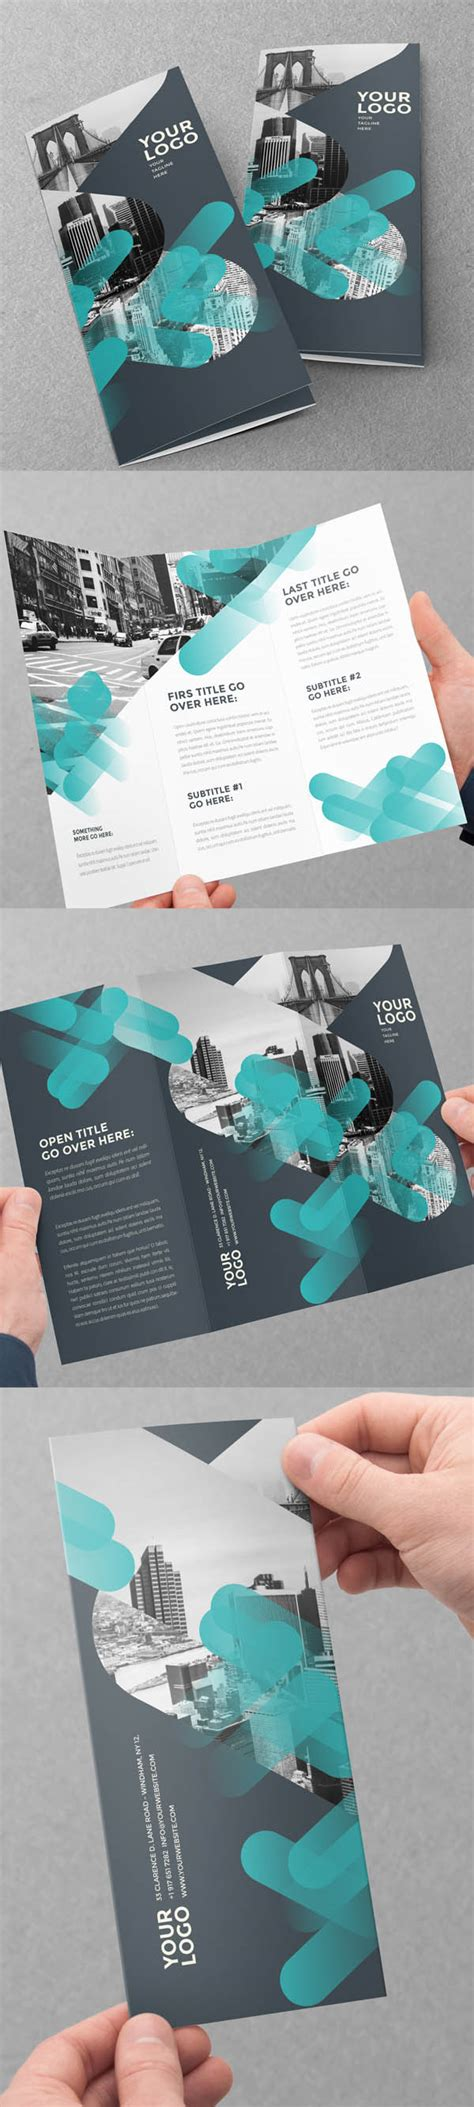 brochure designs best 10 best corporate business brochure designs for